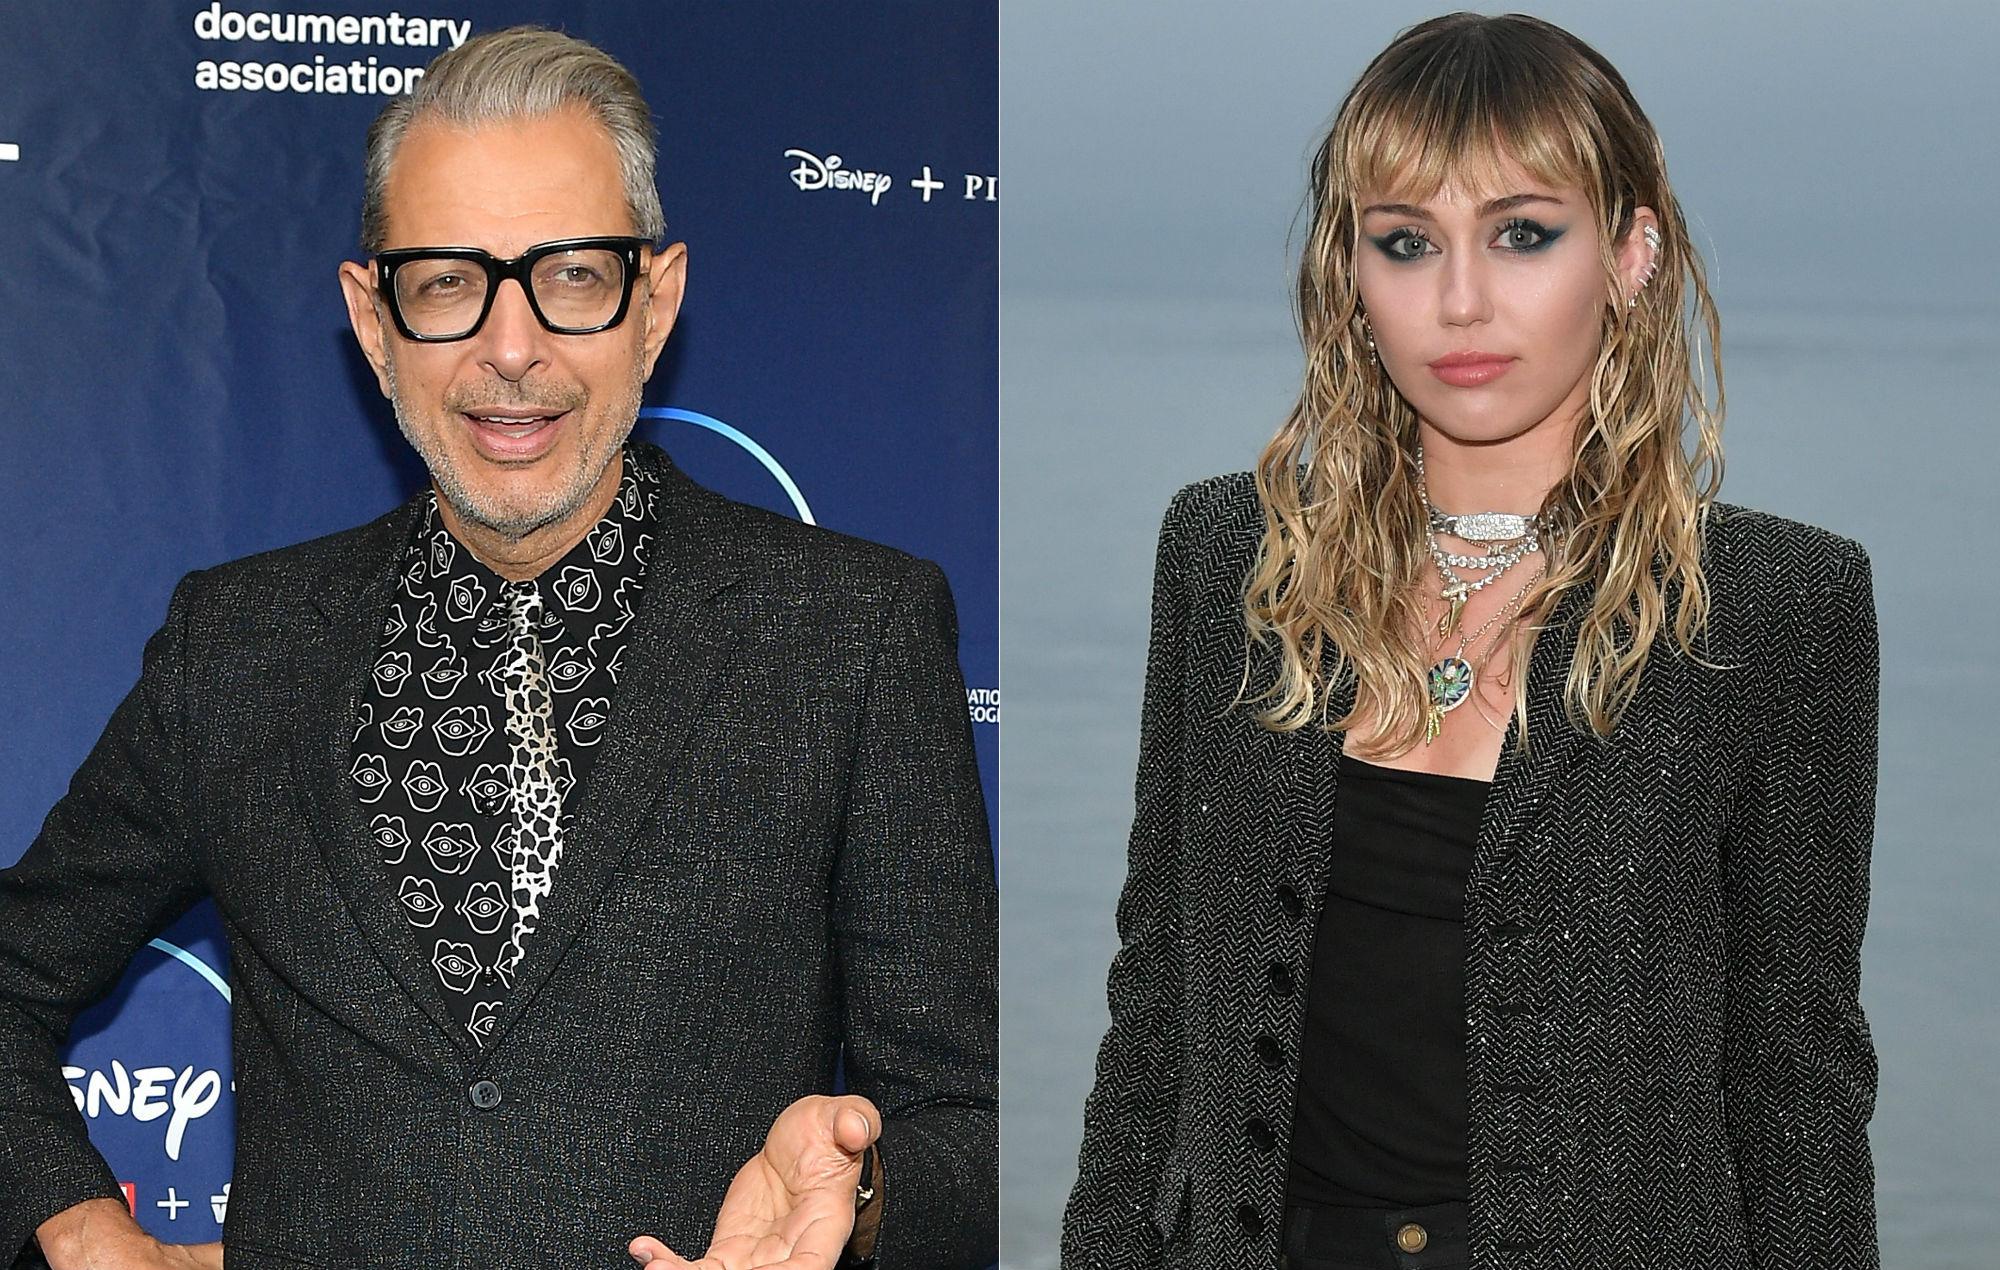 Jeff Goldblum and Miley Cyrus